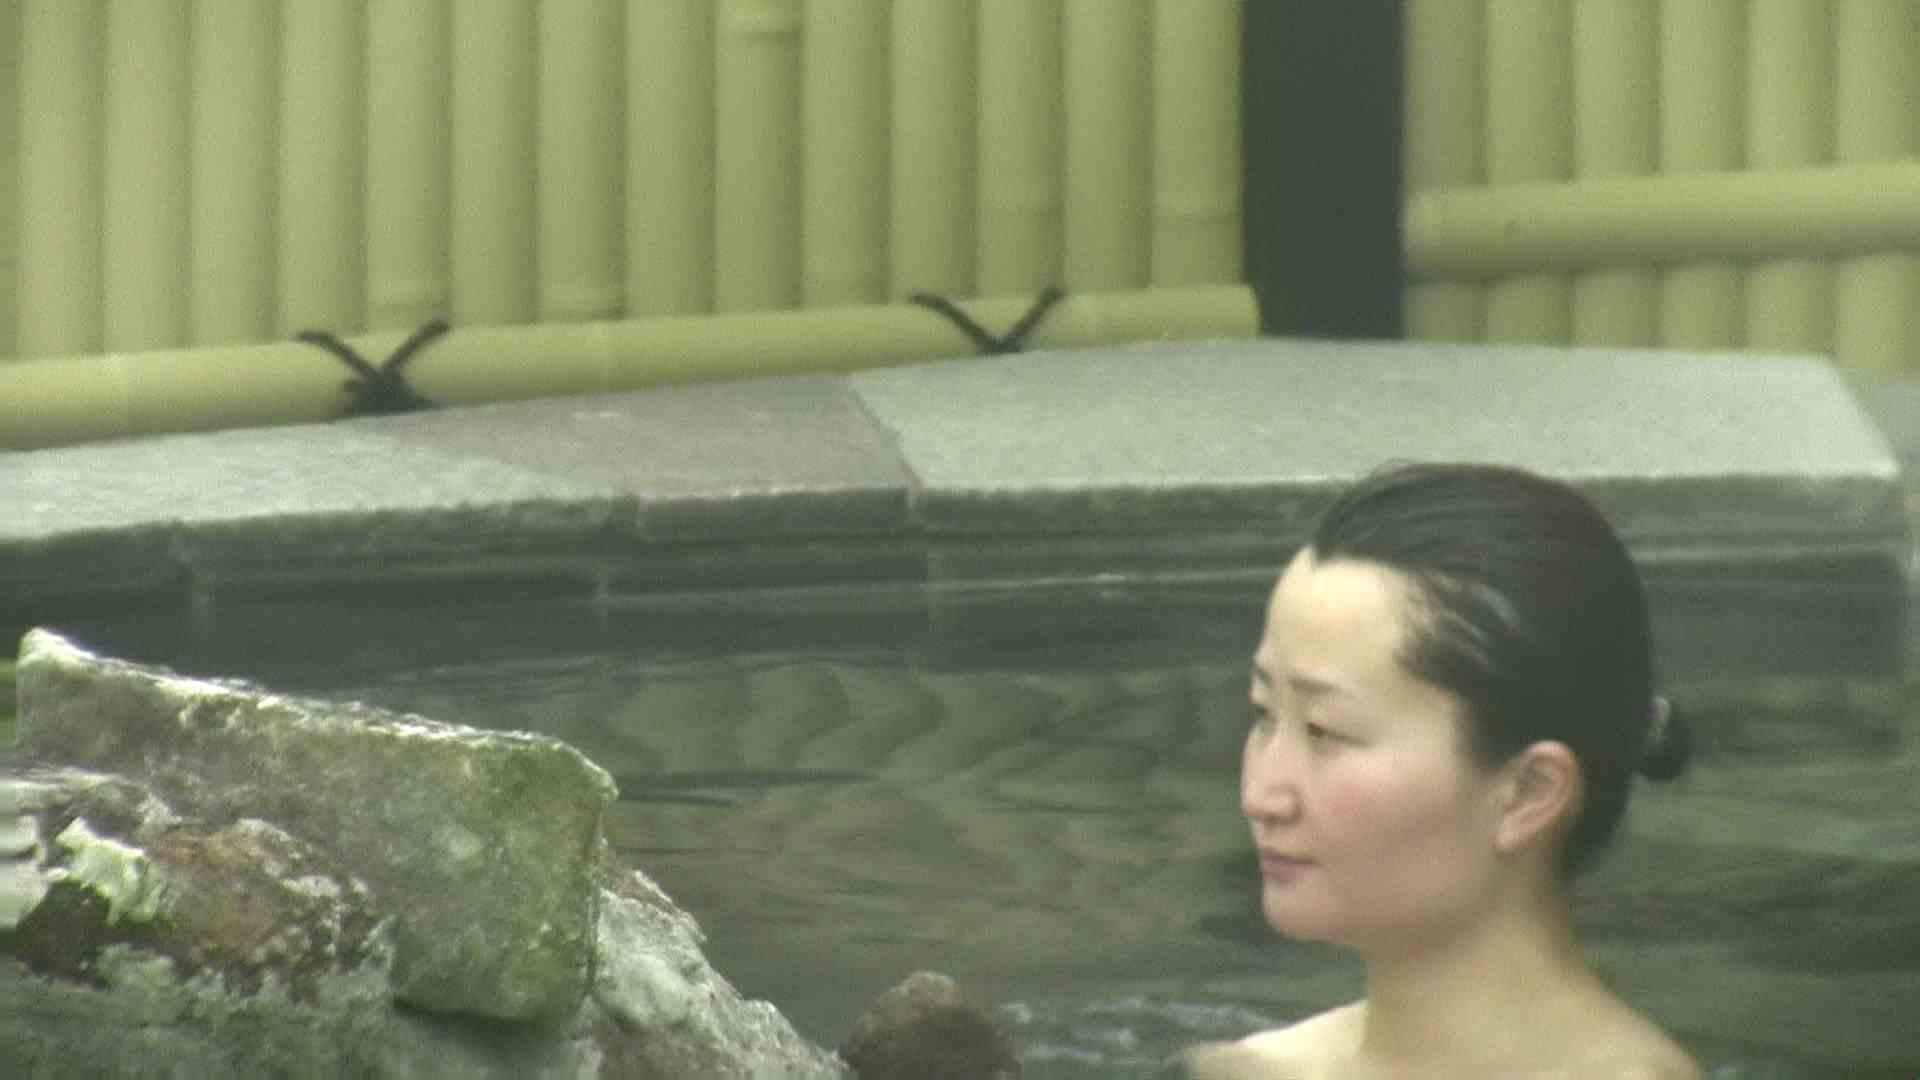 Aquaな露天風呂Vol.632 盗撮シリーズ | 露天風呂編  100PIX 27